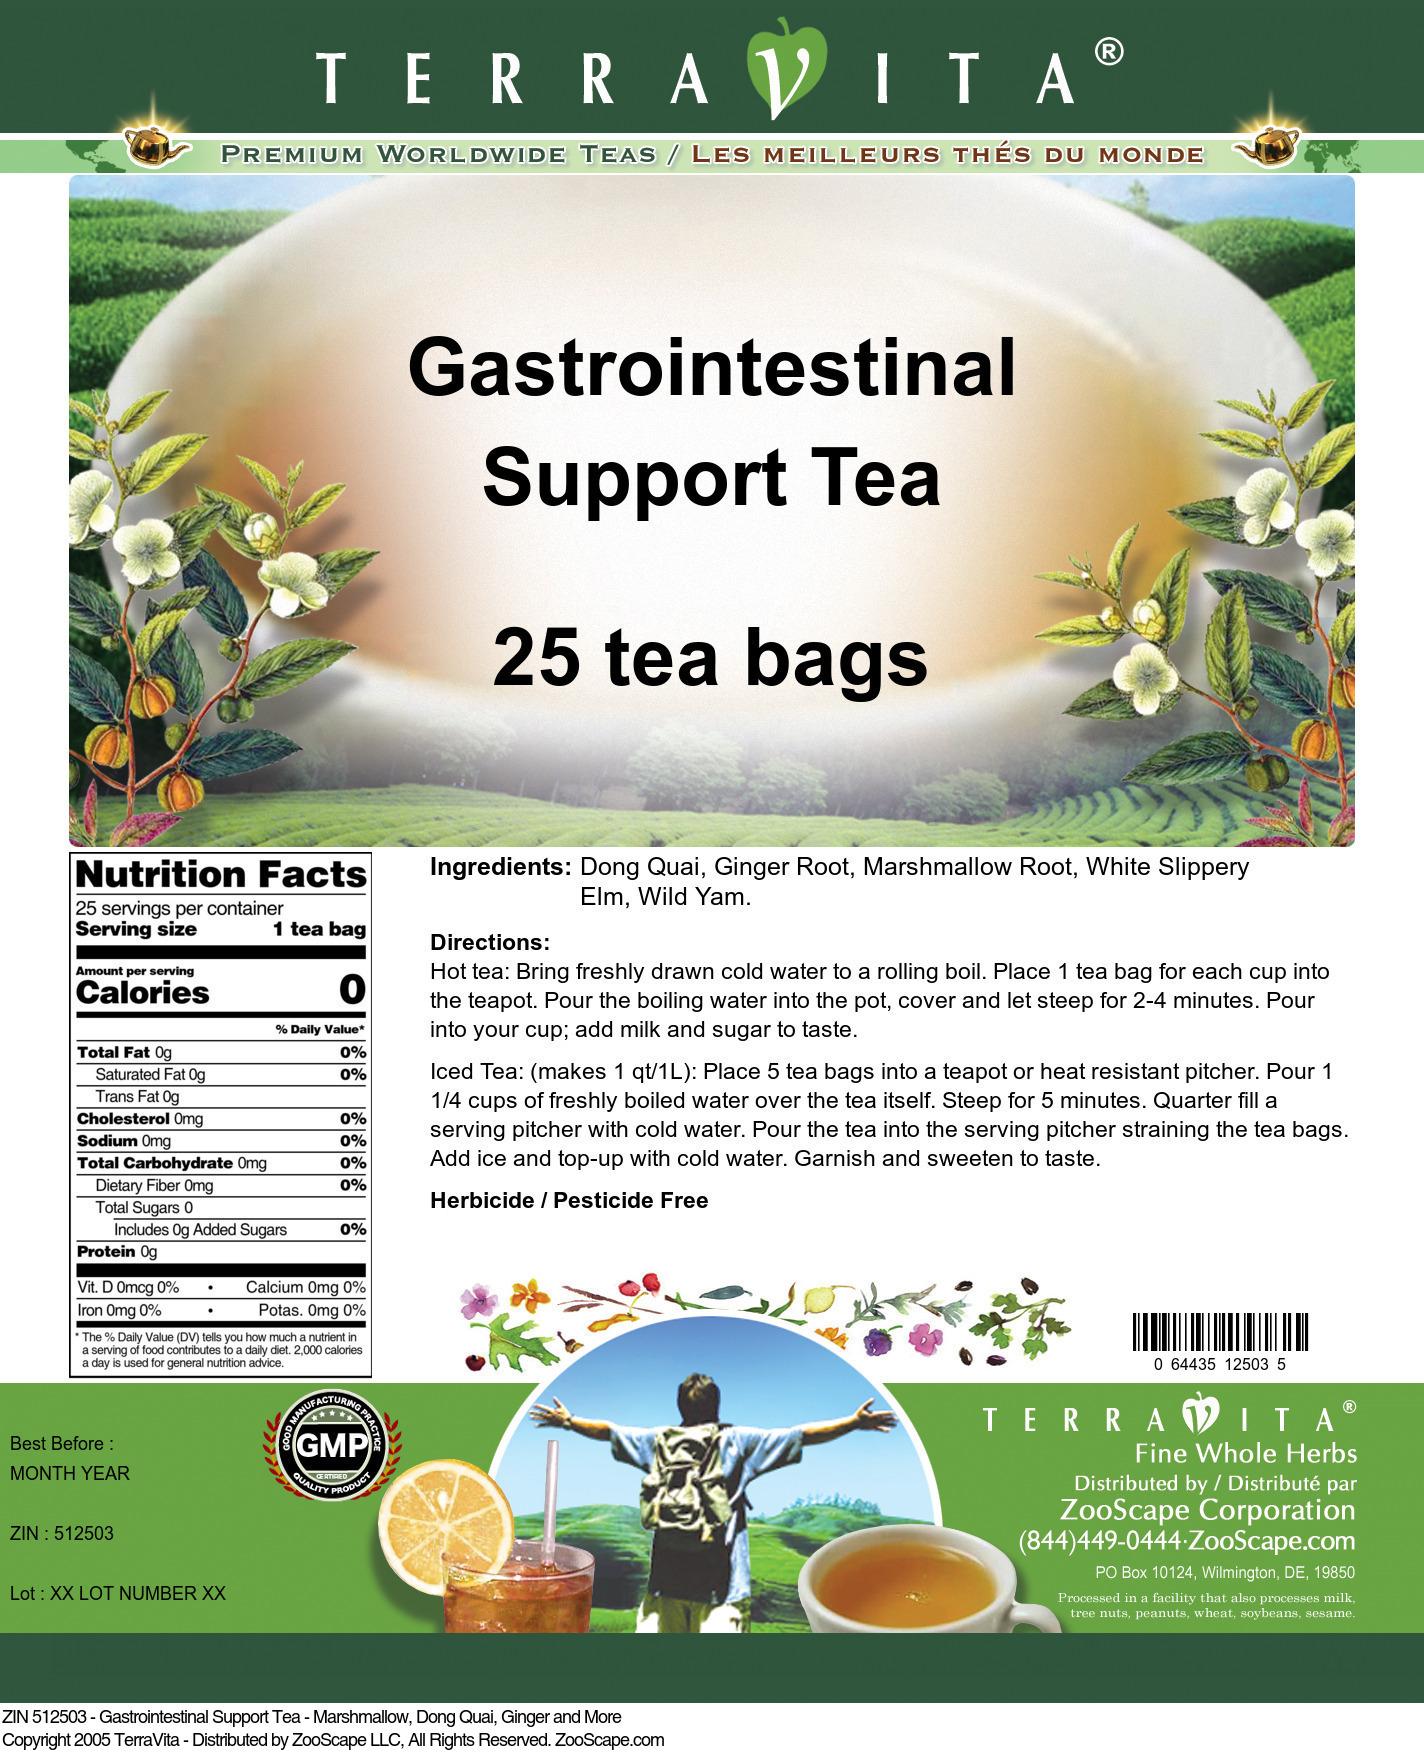 Gastrointestinal Support